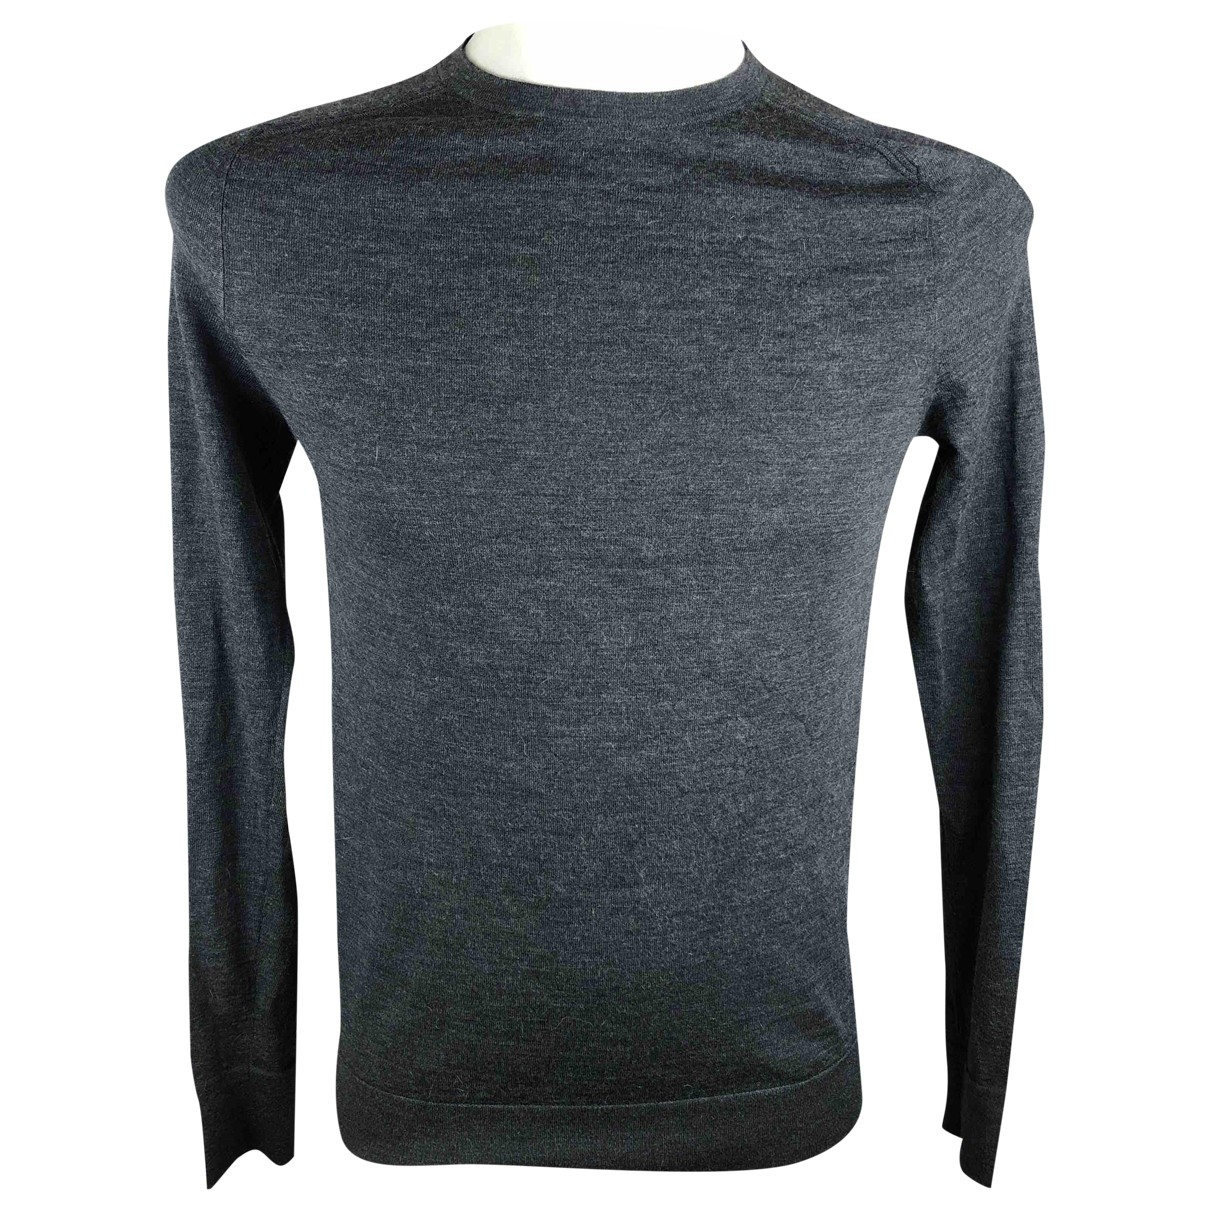 Balenciaga \N Grey Cashmere Knitwear & Sweatshirts for Men S International